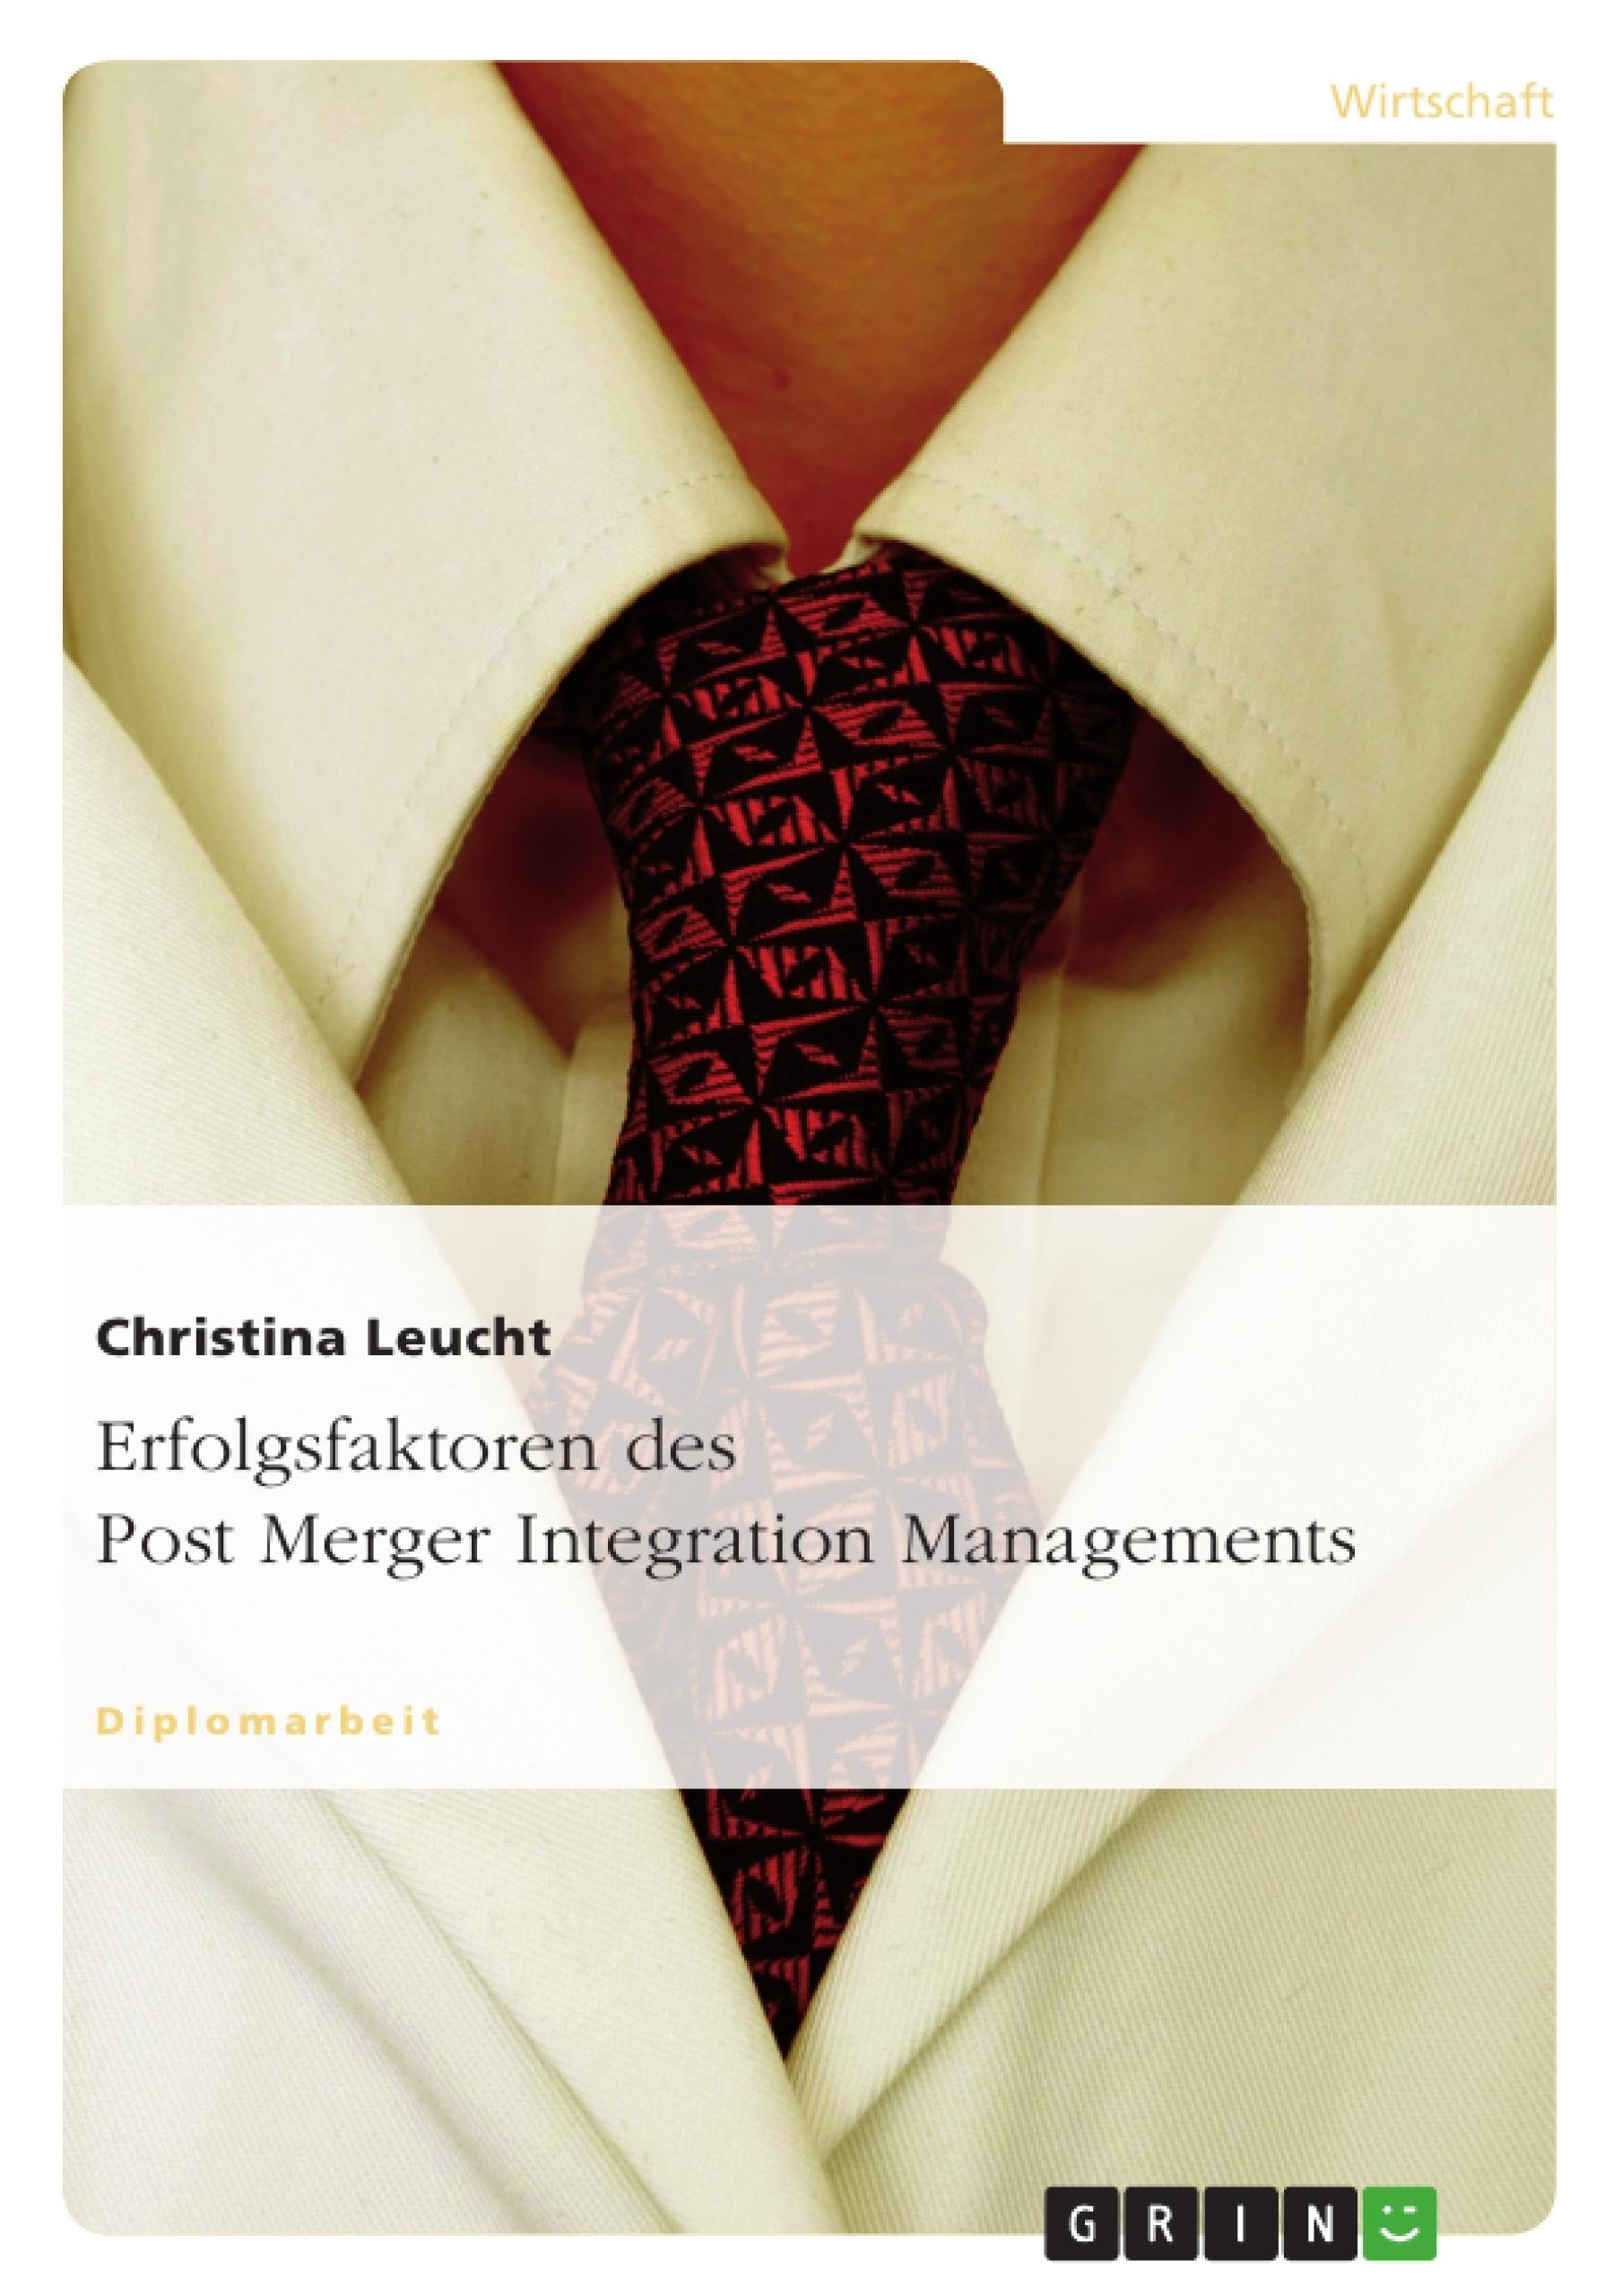 Titel: Erfolgsfaktoren des Post Merger Integration Managements